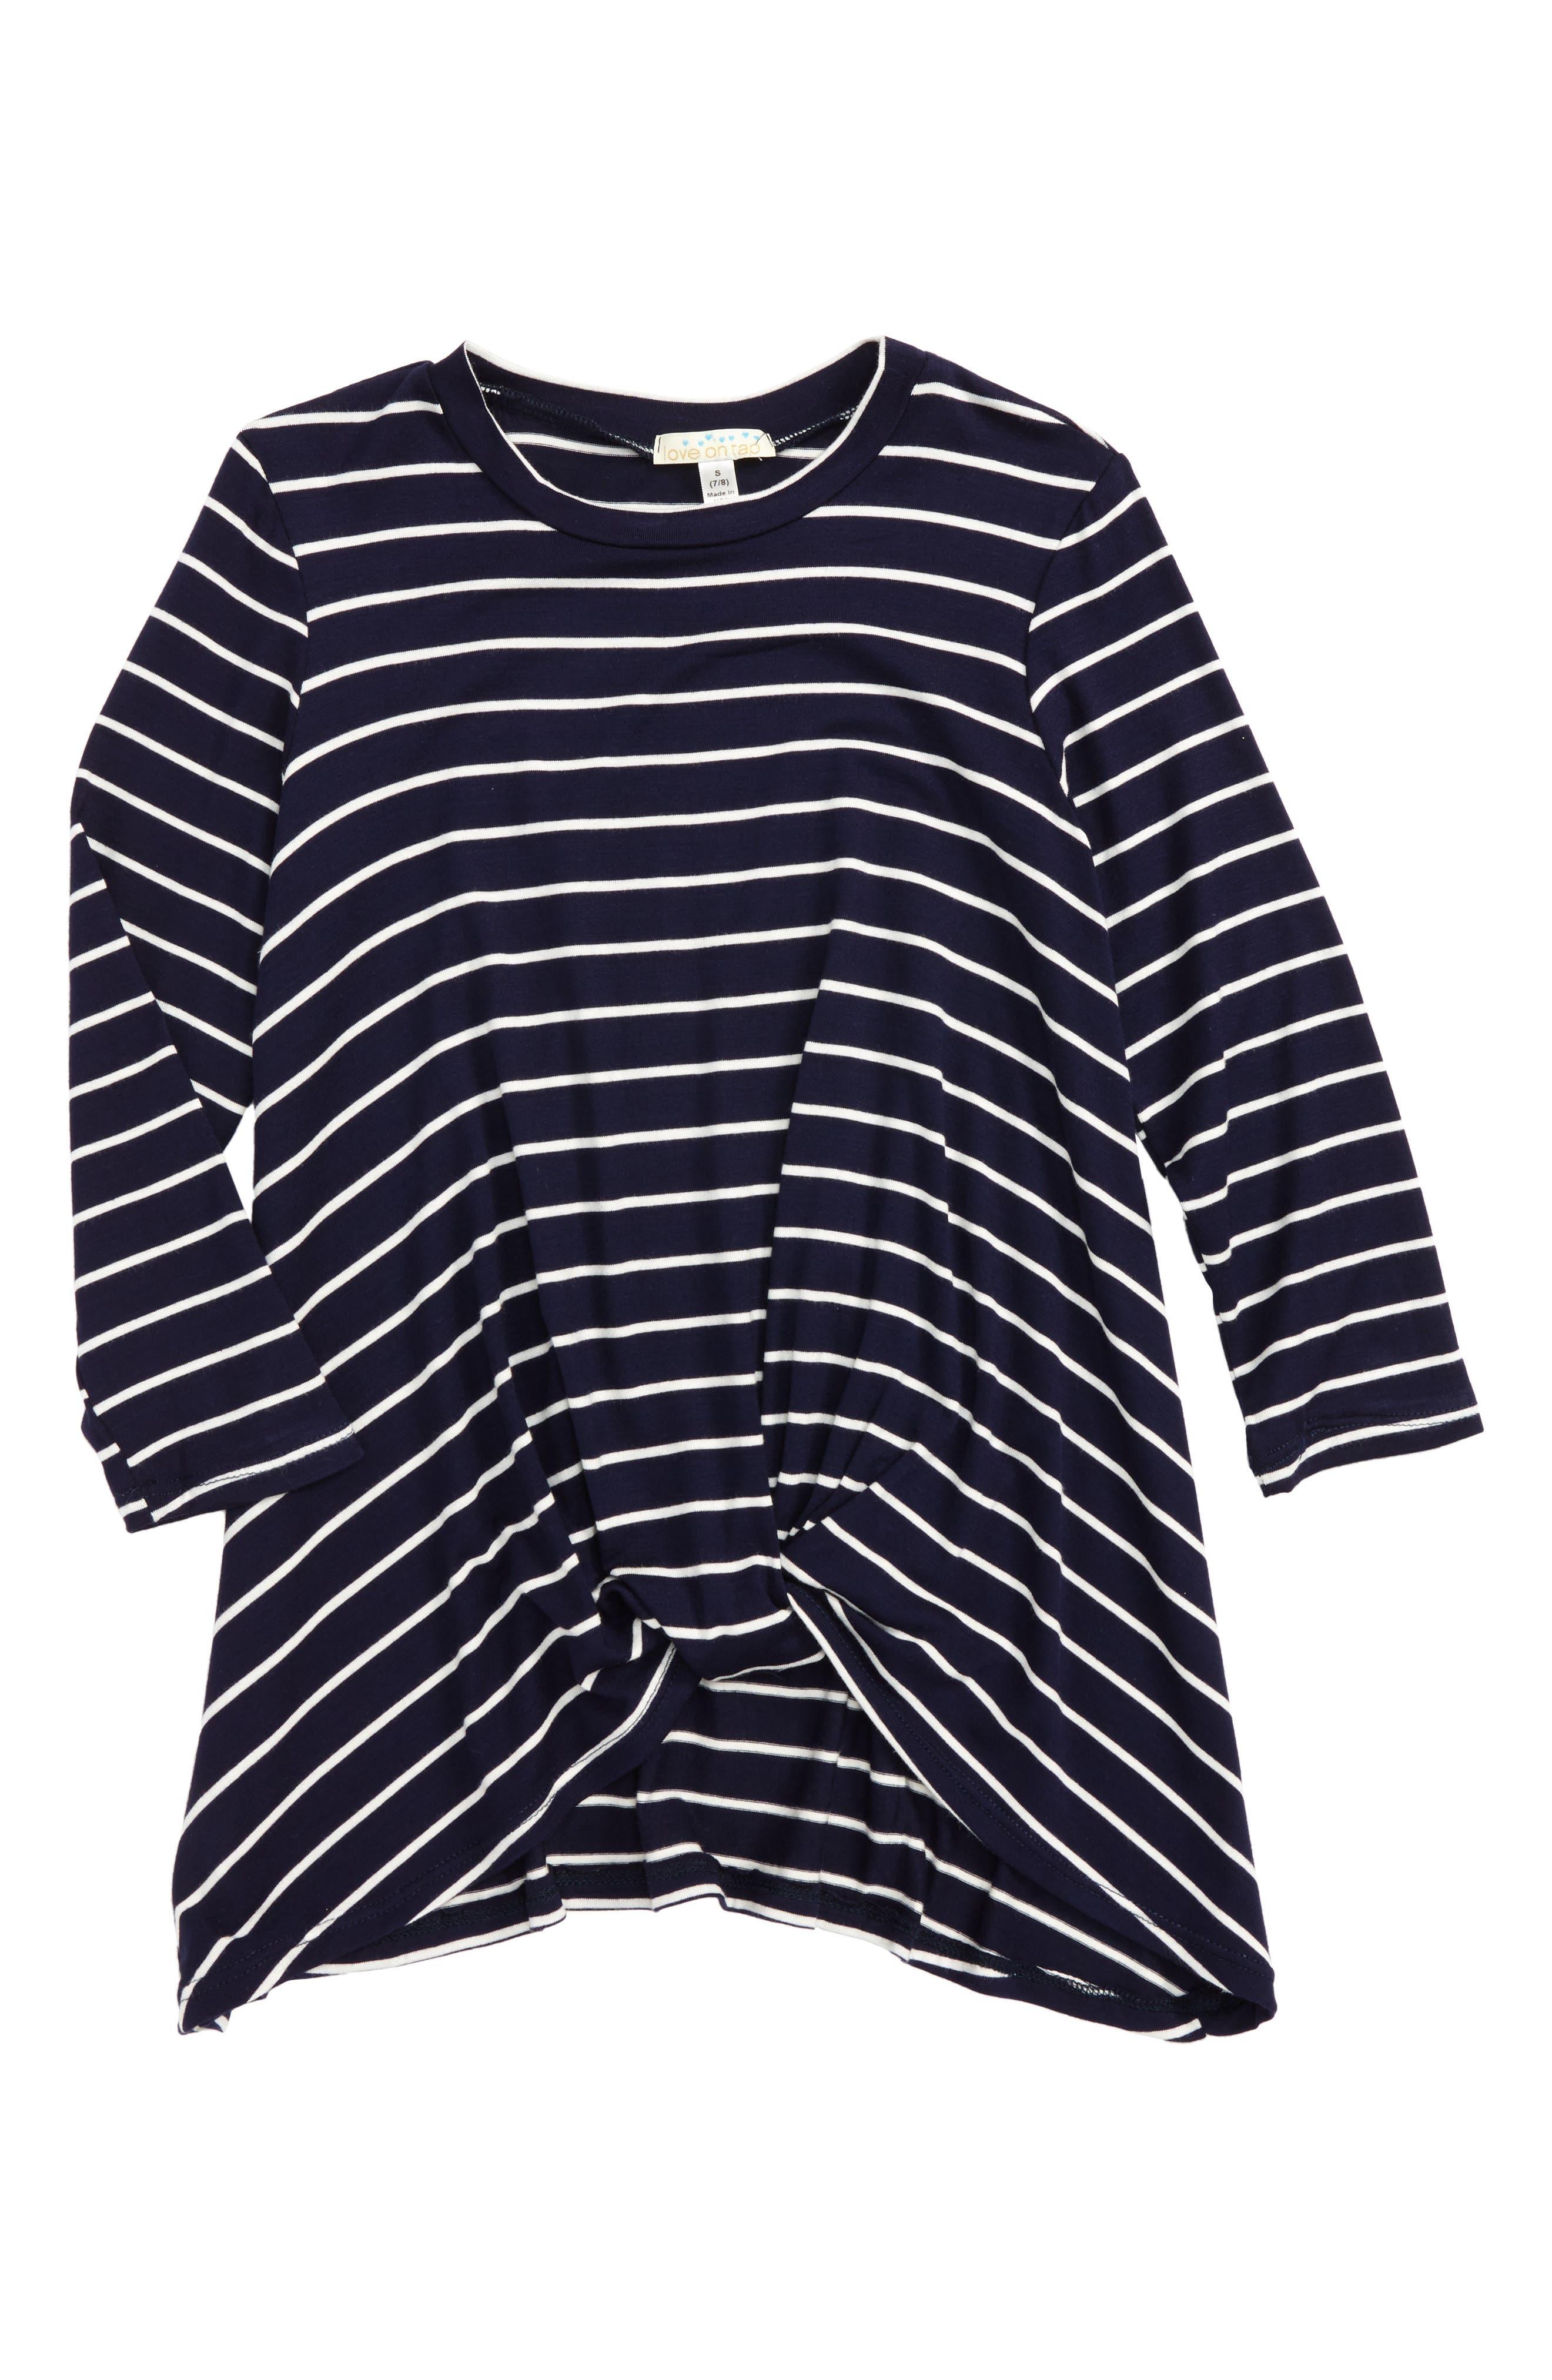 Stripe Tee,                             Main thumbnail 1, color,                             Navy/ White